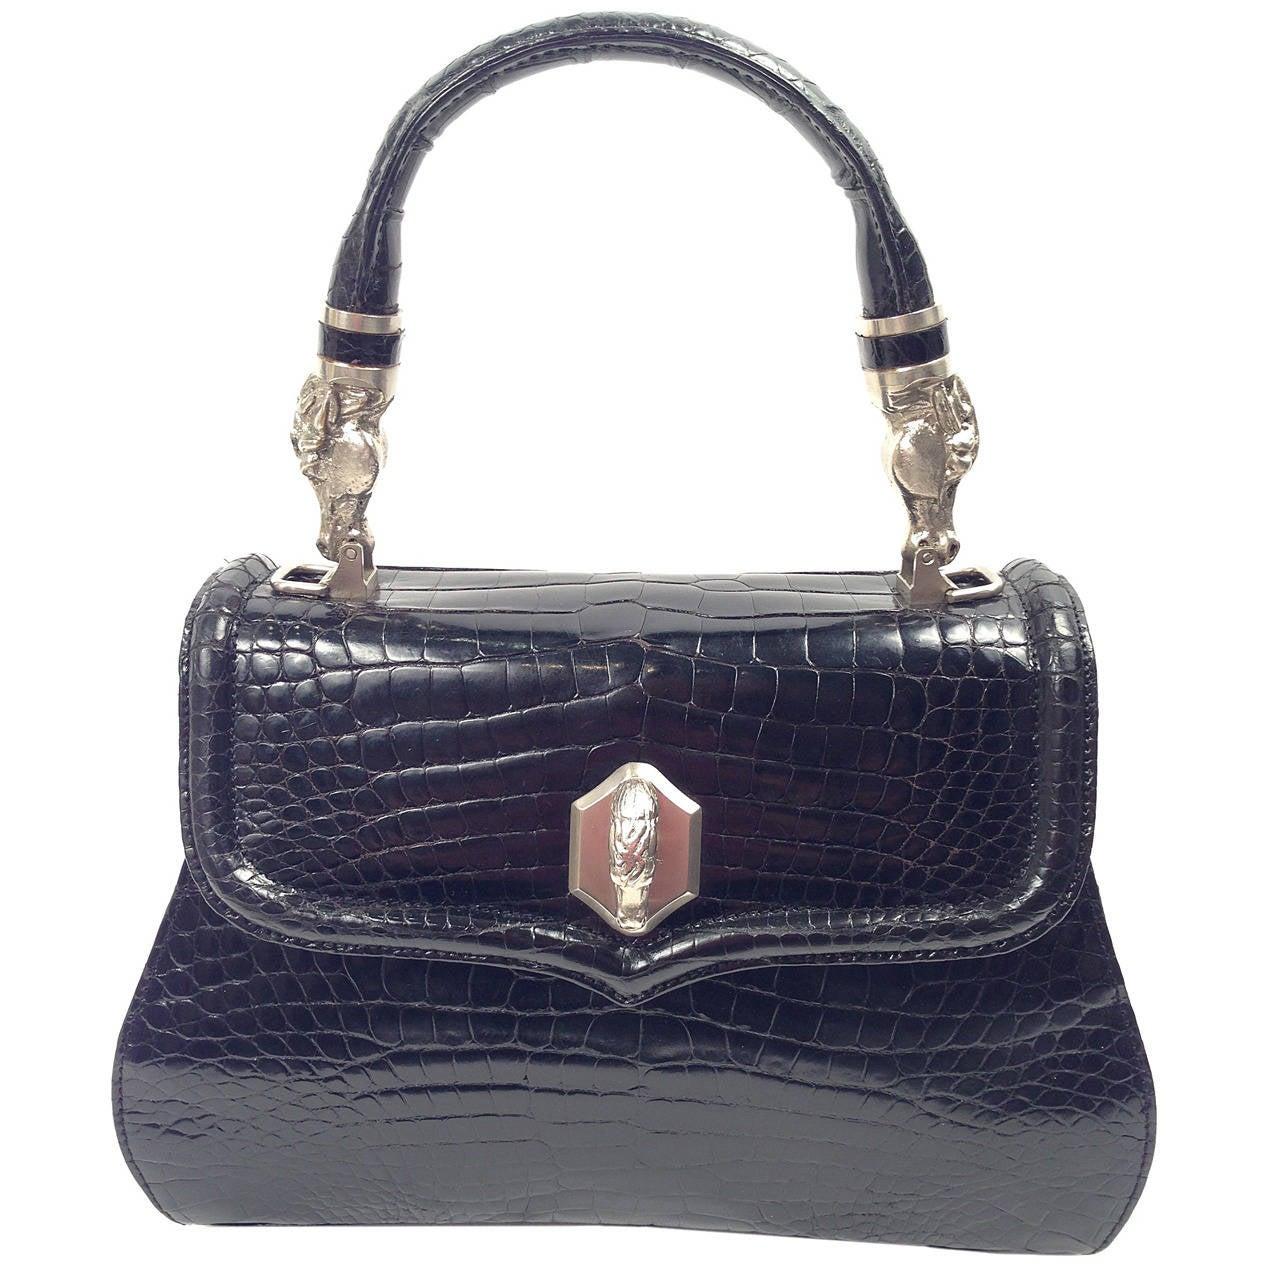 Vintage Siso Black Crocodile Structured Handbag With Horse